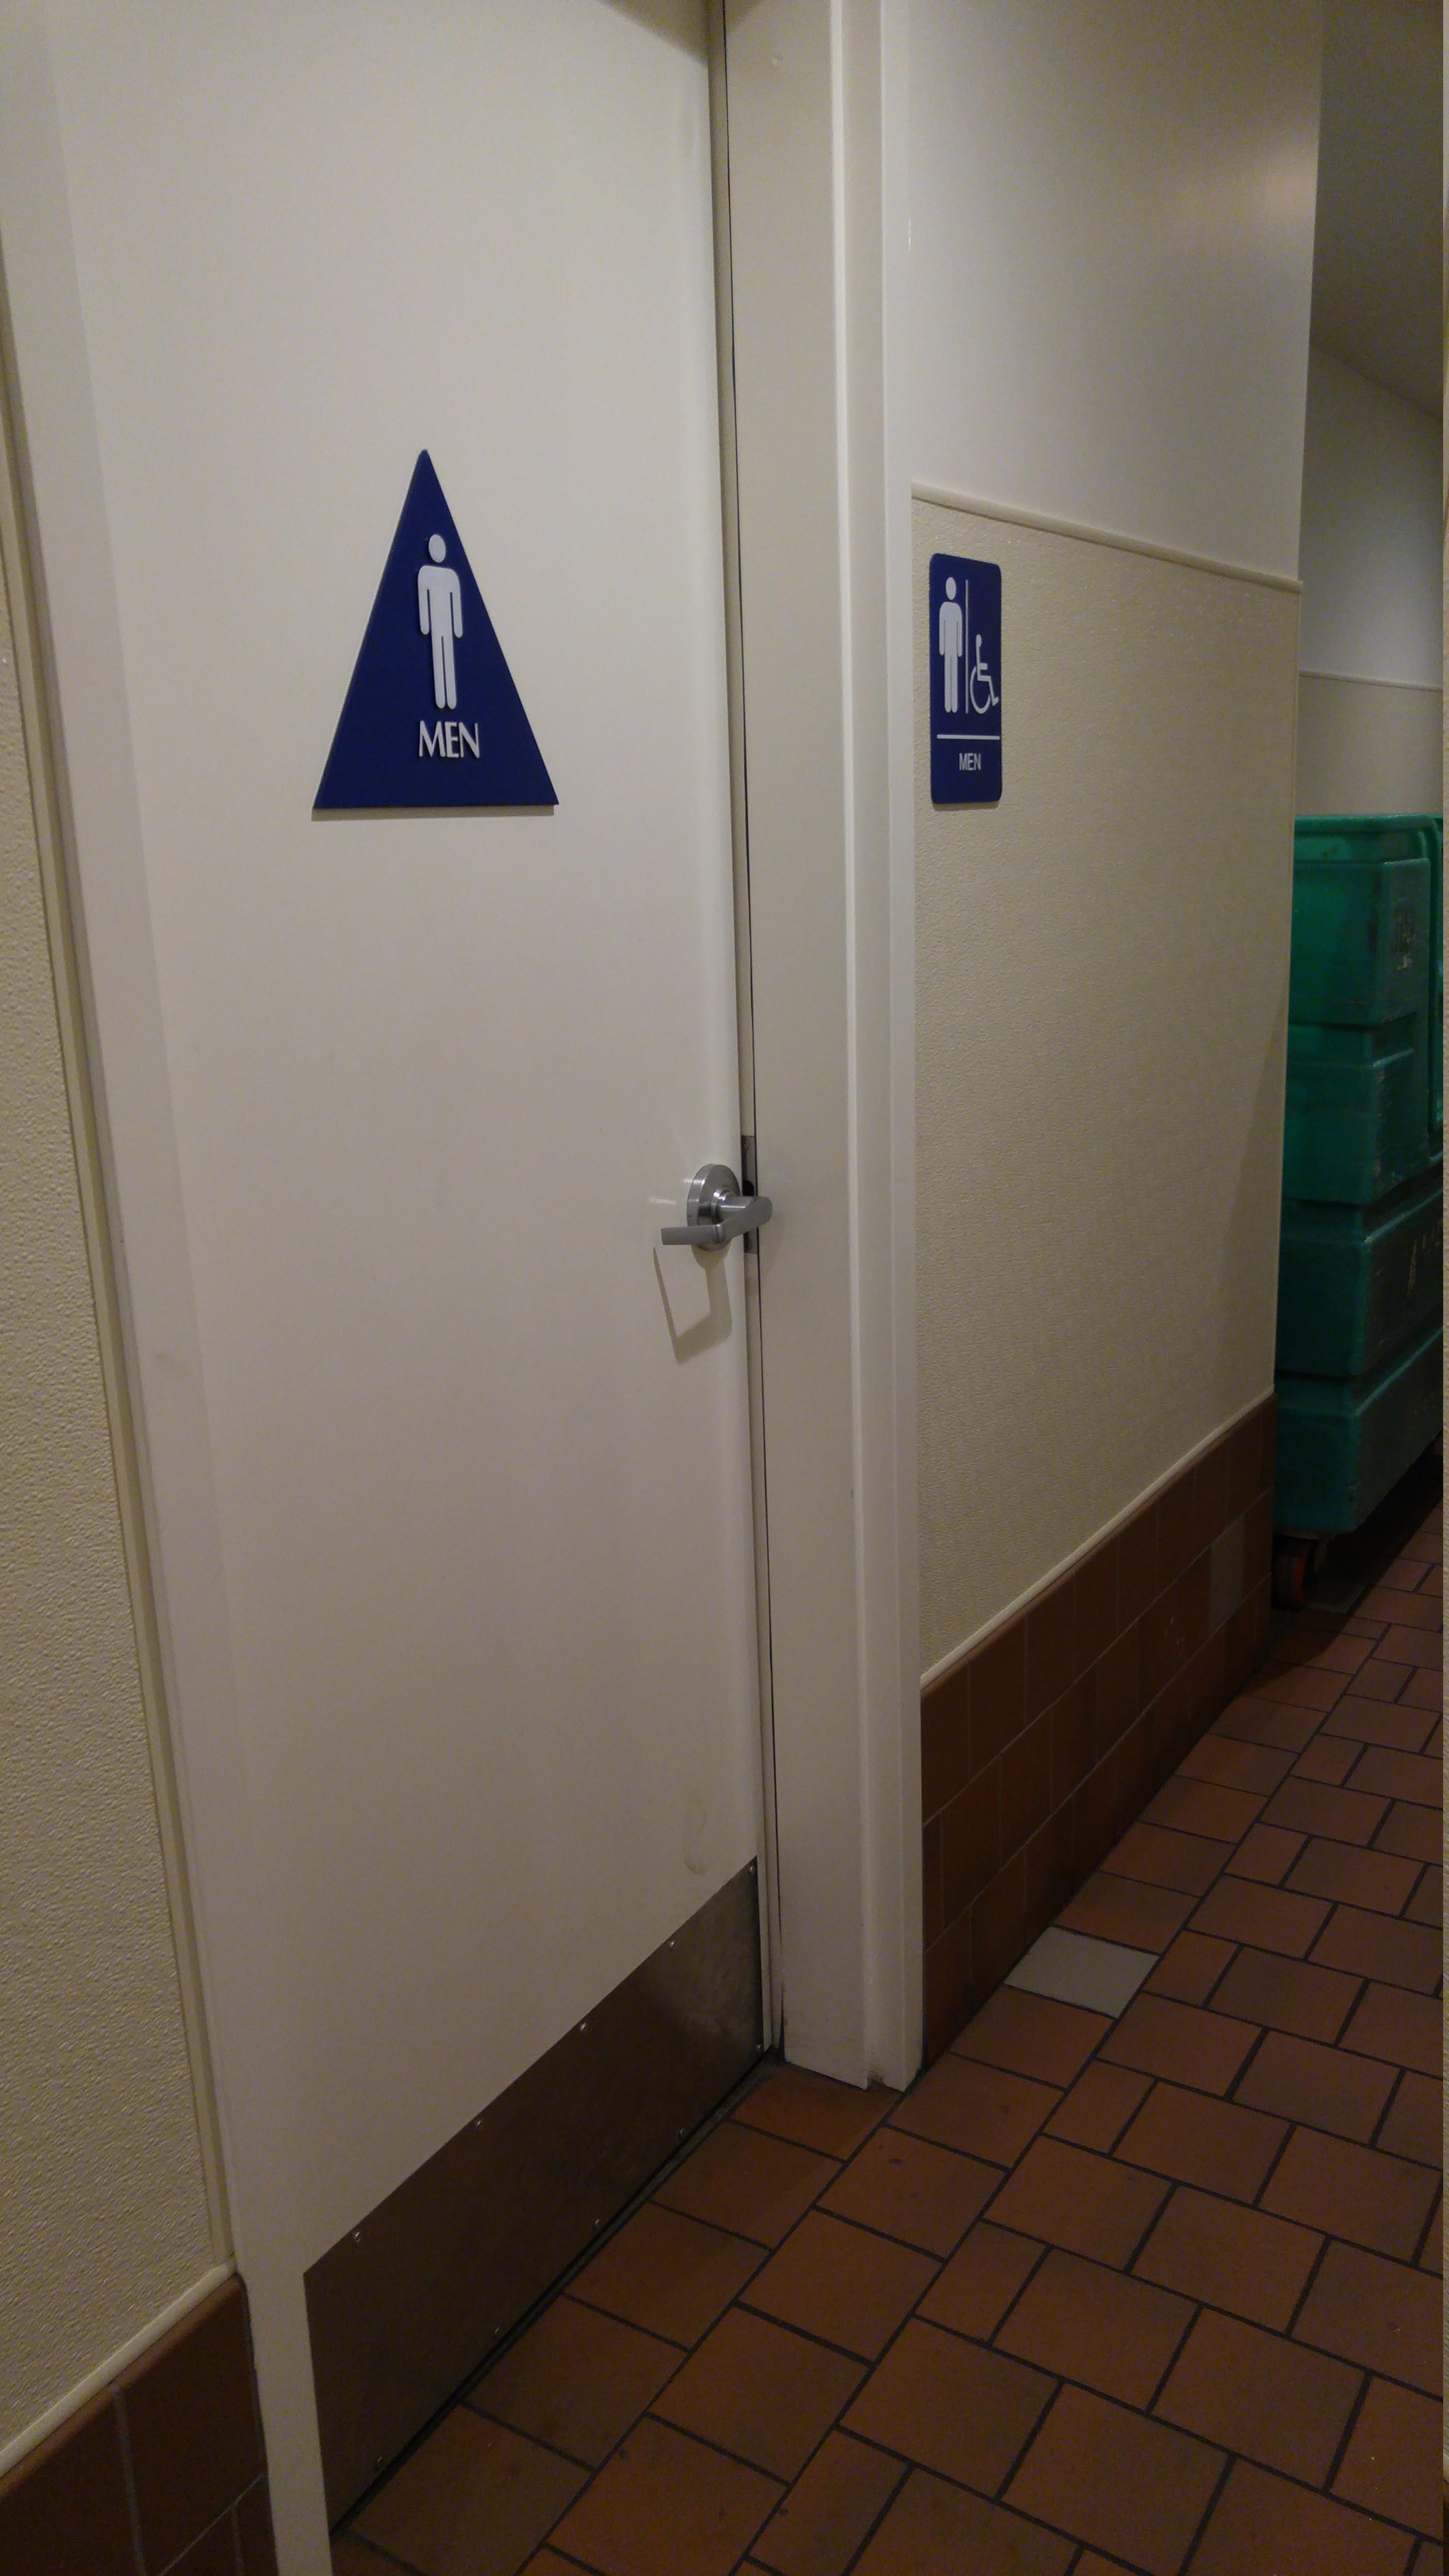 Bathroom Signs California springs brewery, fairfax, california - bathroom review